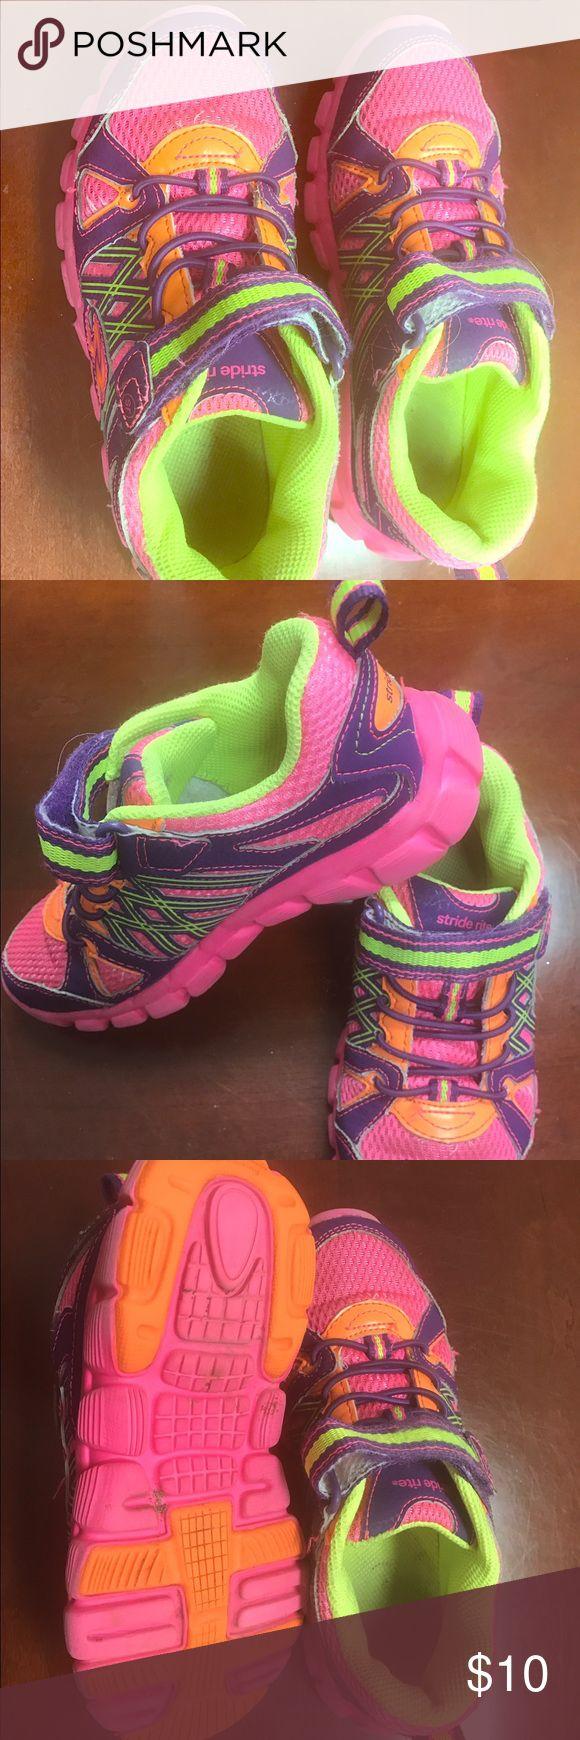 Stride Rite Sneakers for Girls Stride Rite Sneakers 👟 for girls. Size: 2 Stride Rite Shoes Sneakers